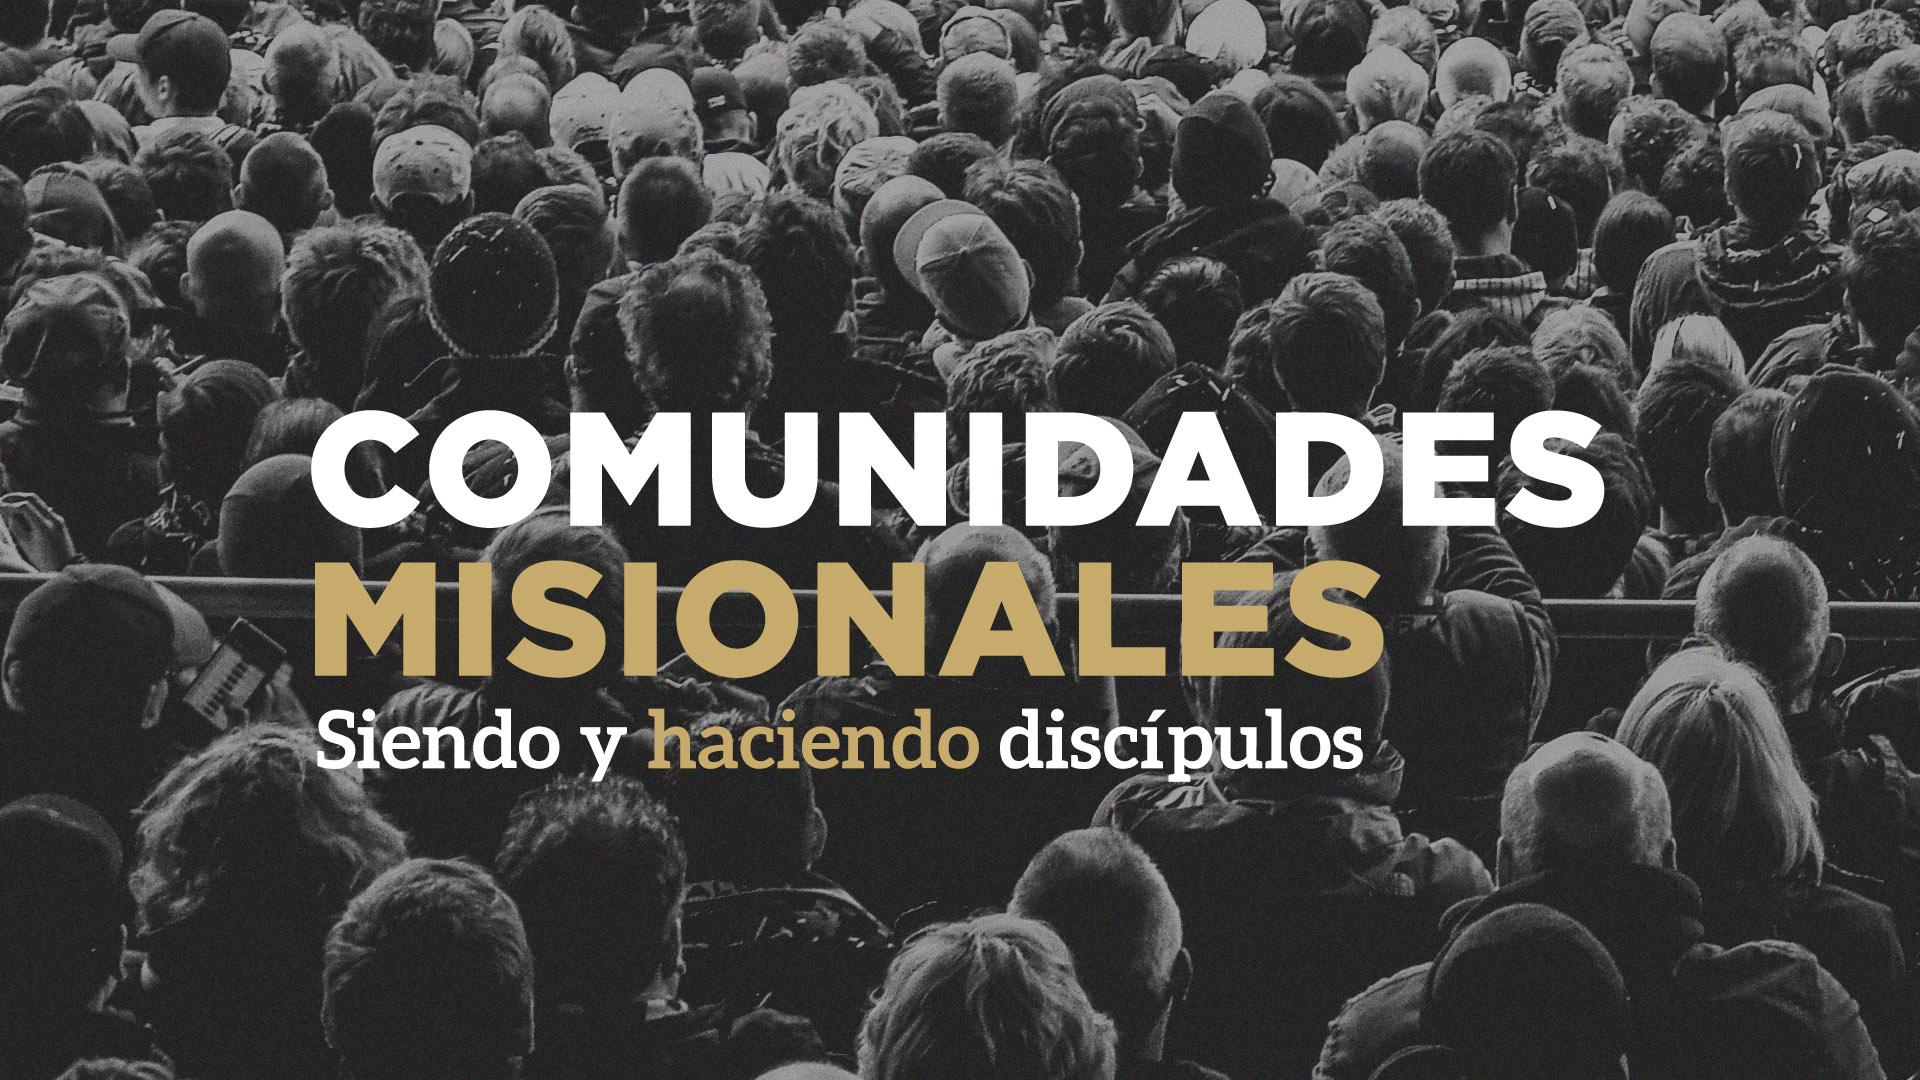 comunidad-misional-vimeo.jpg